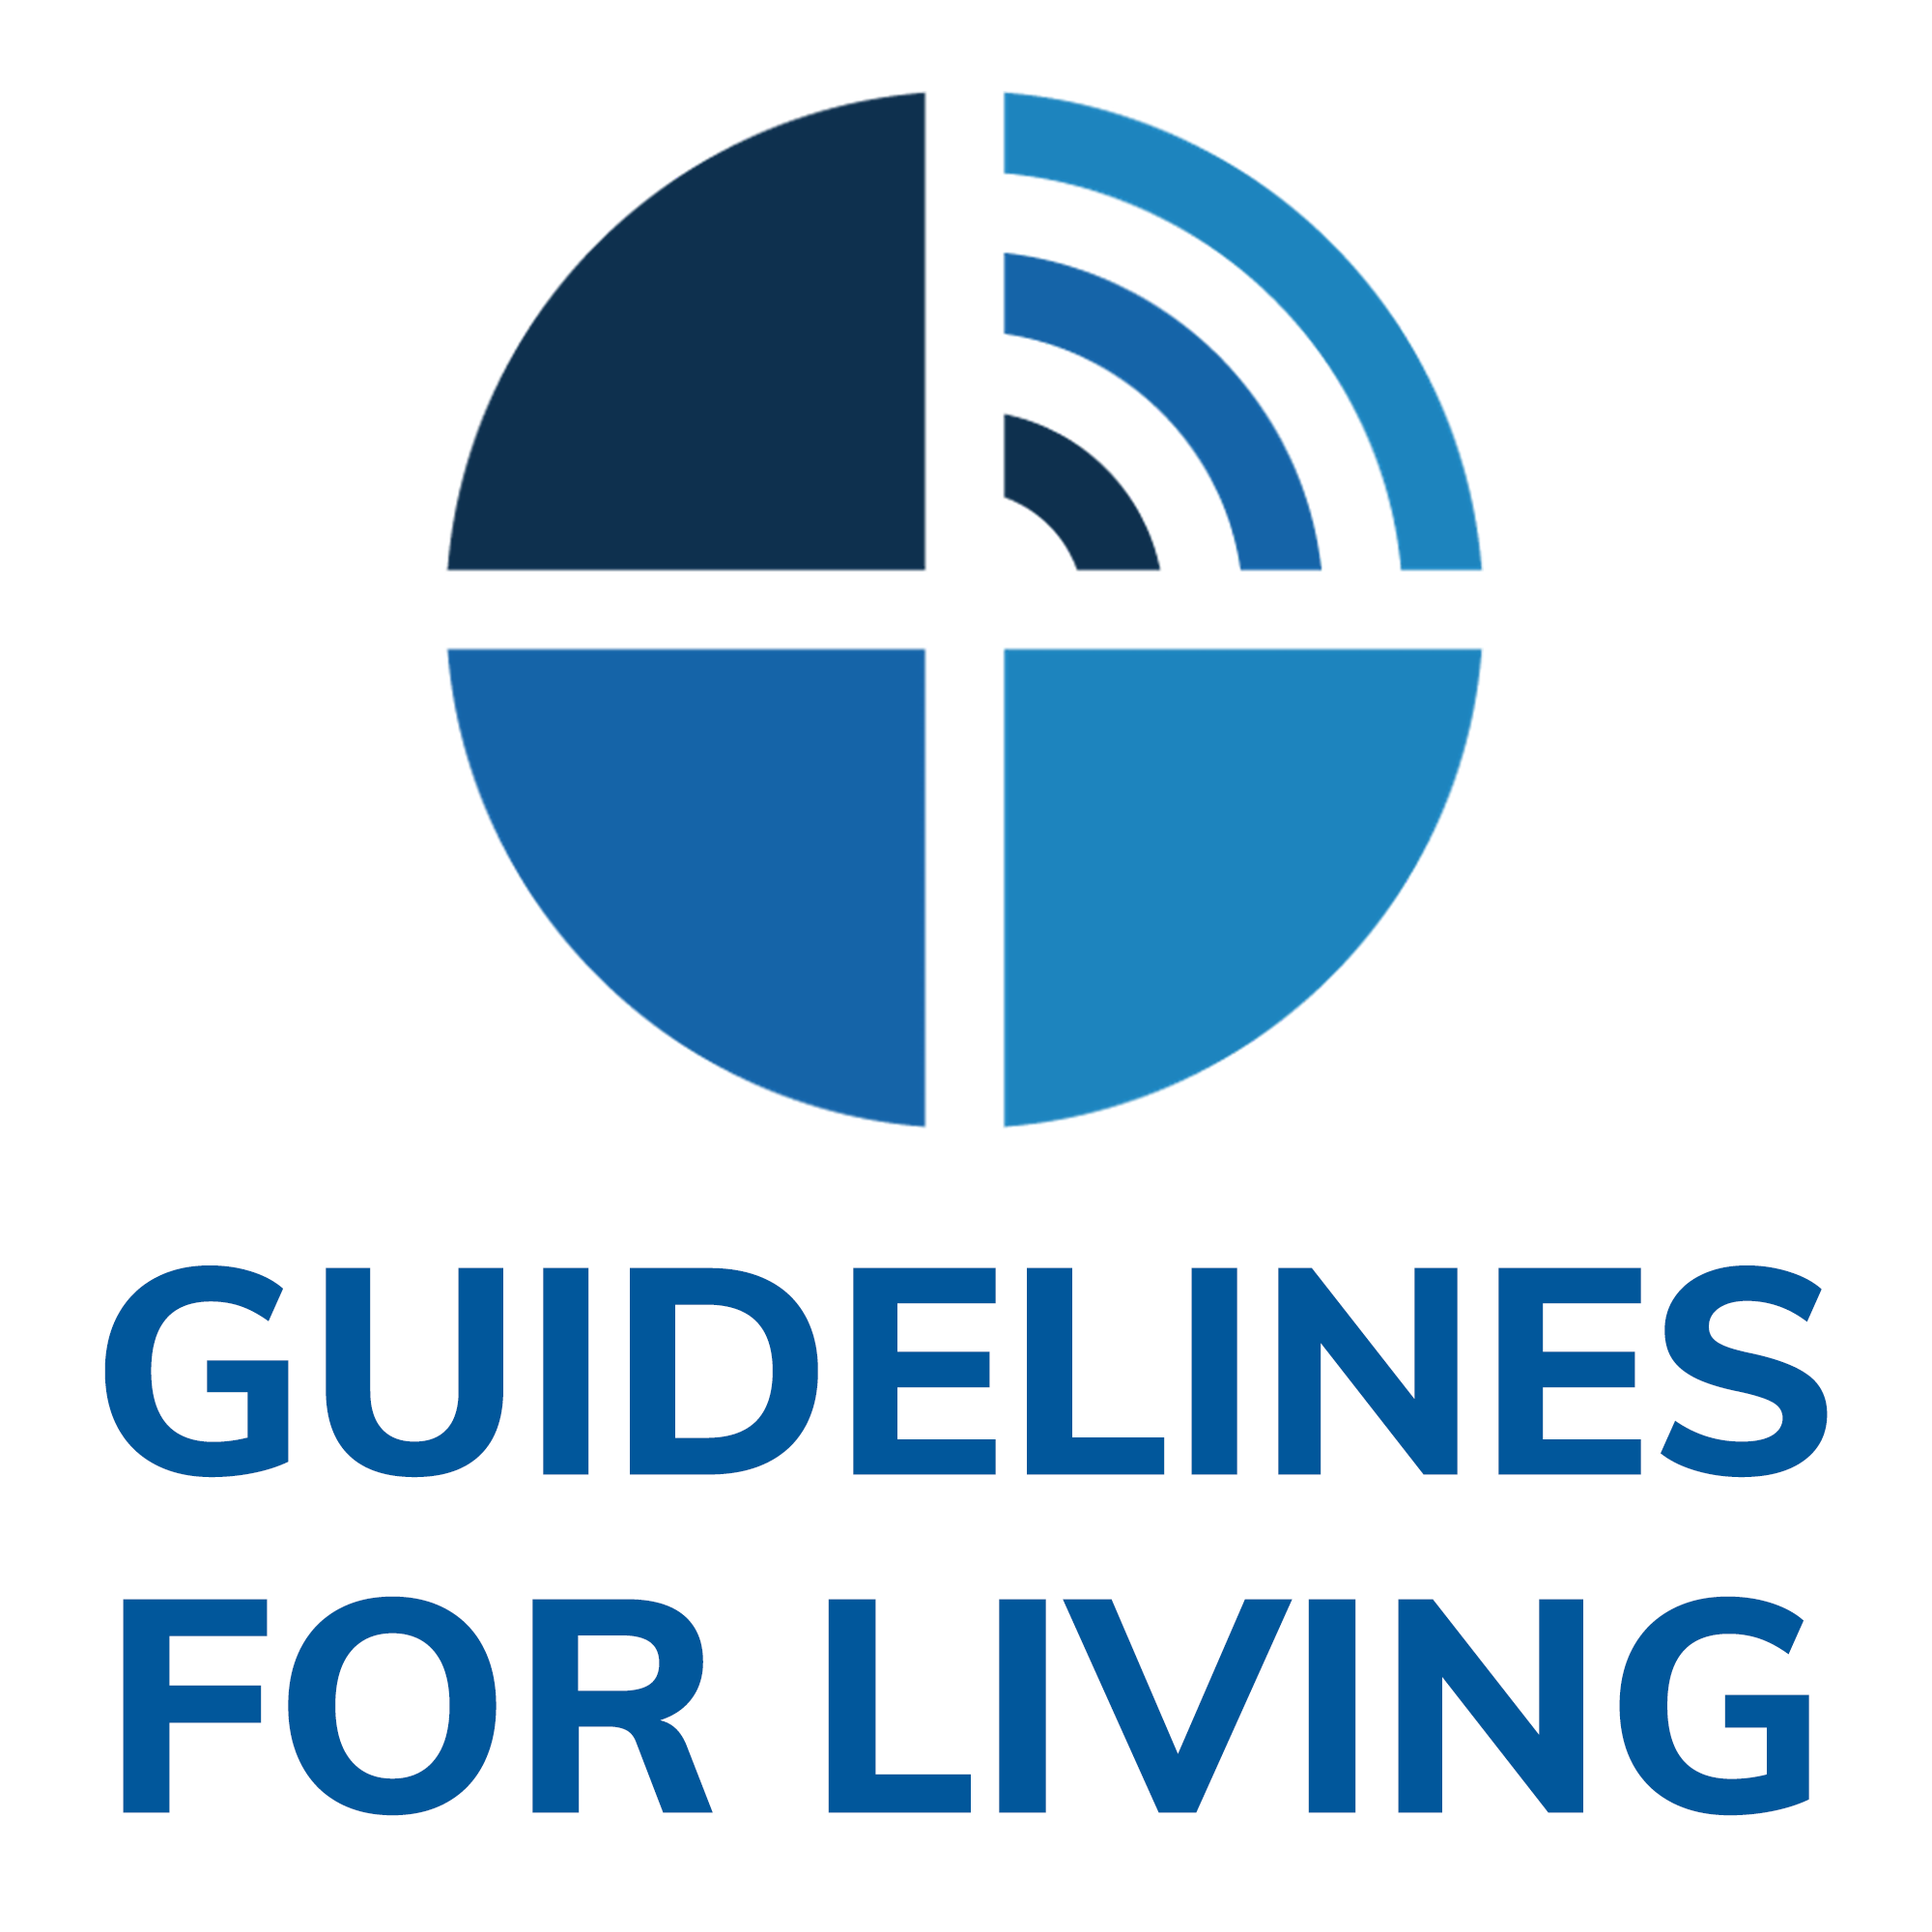 Guidelines For Living